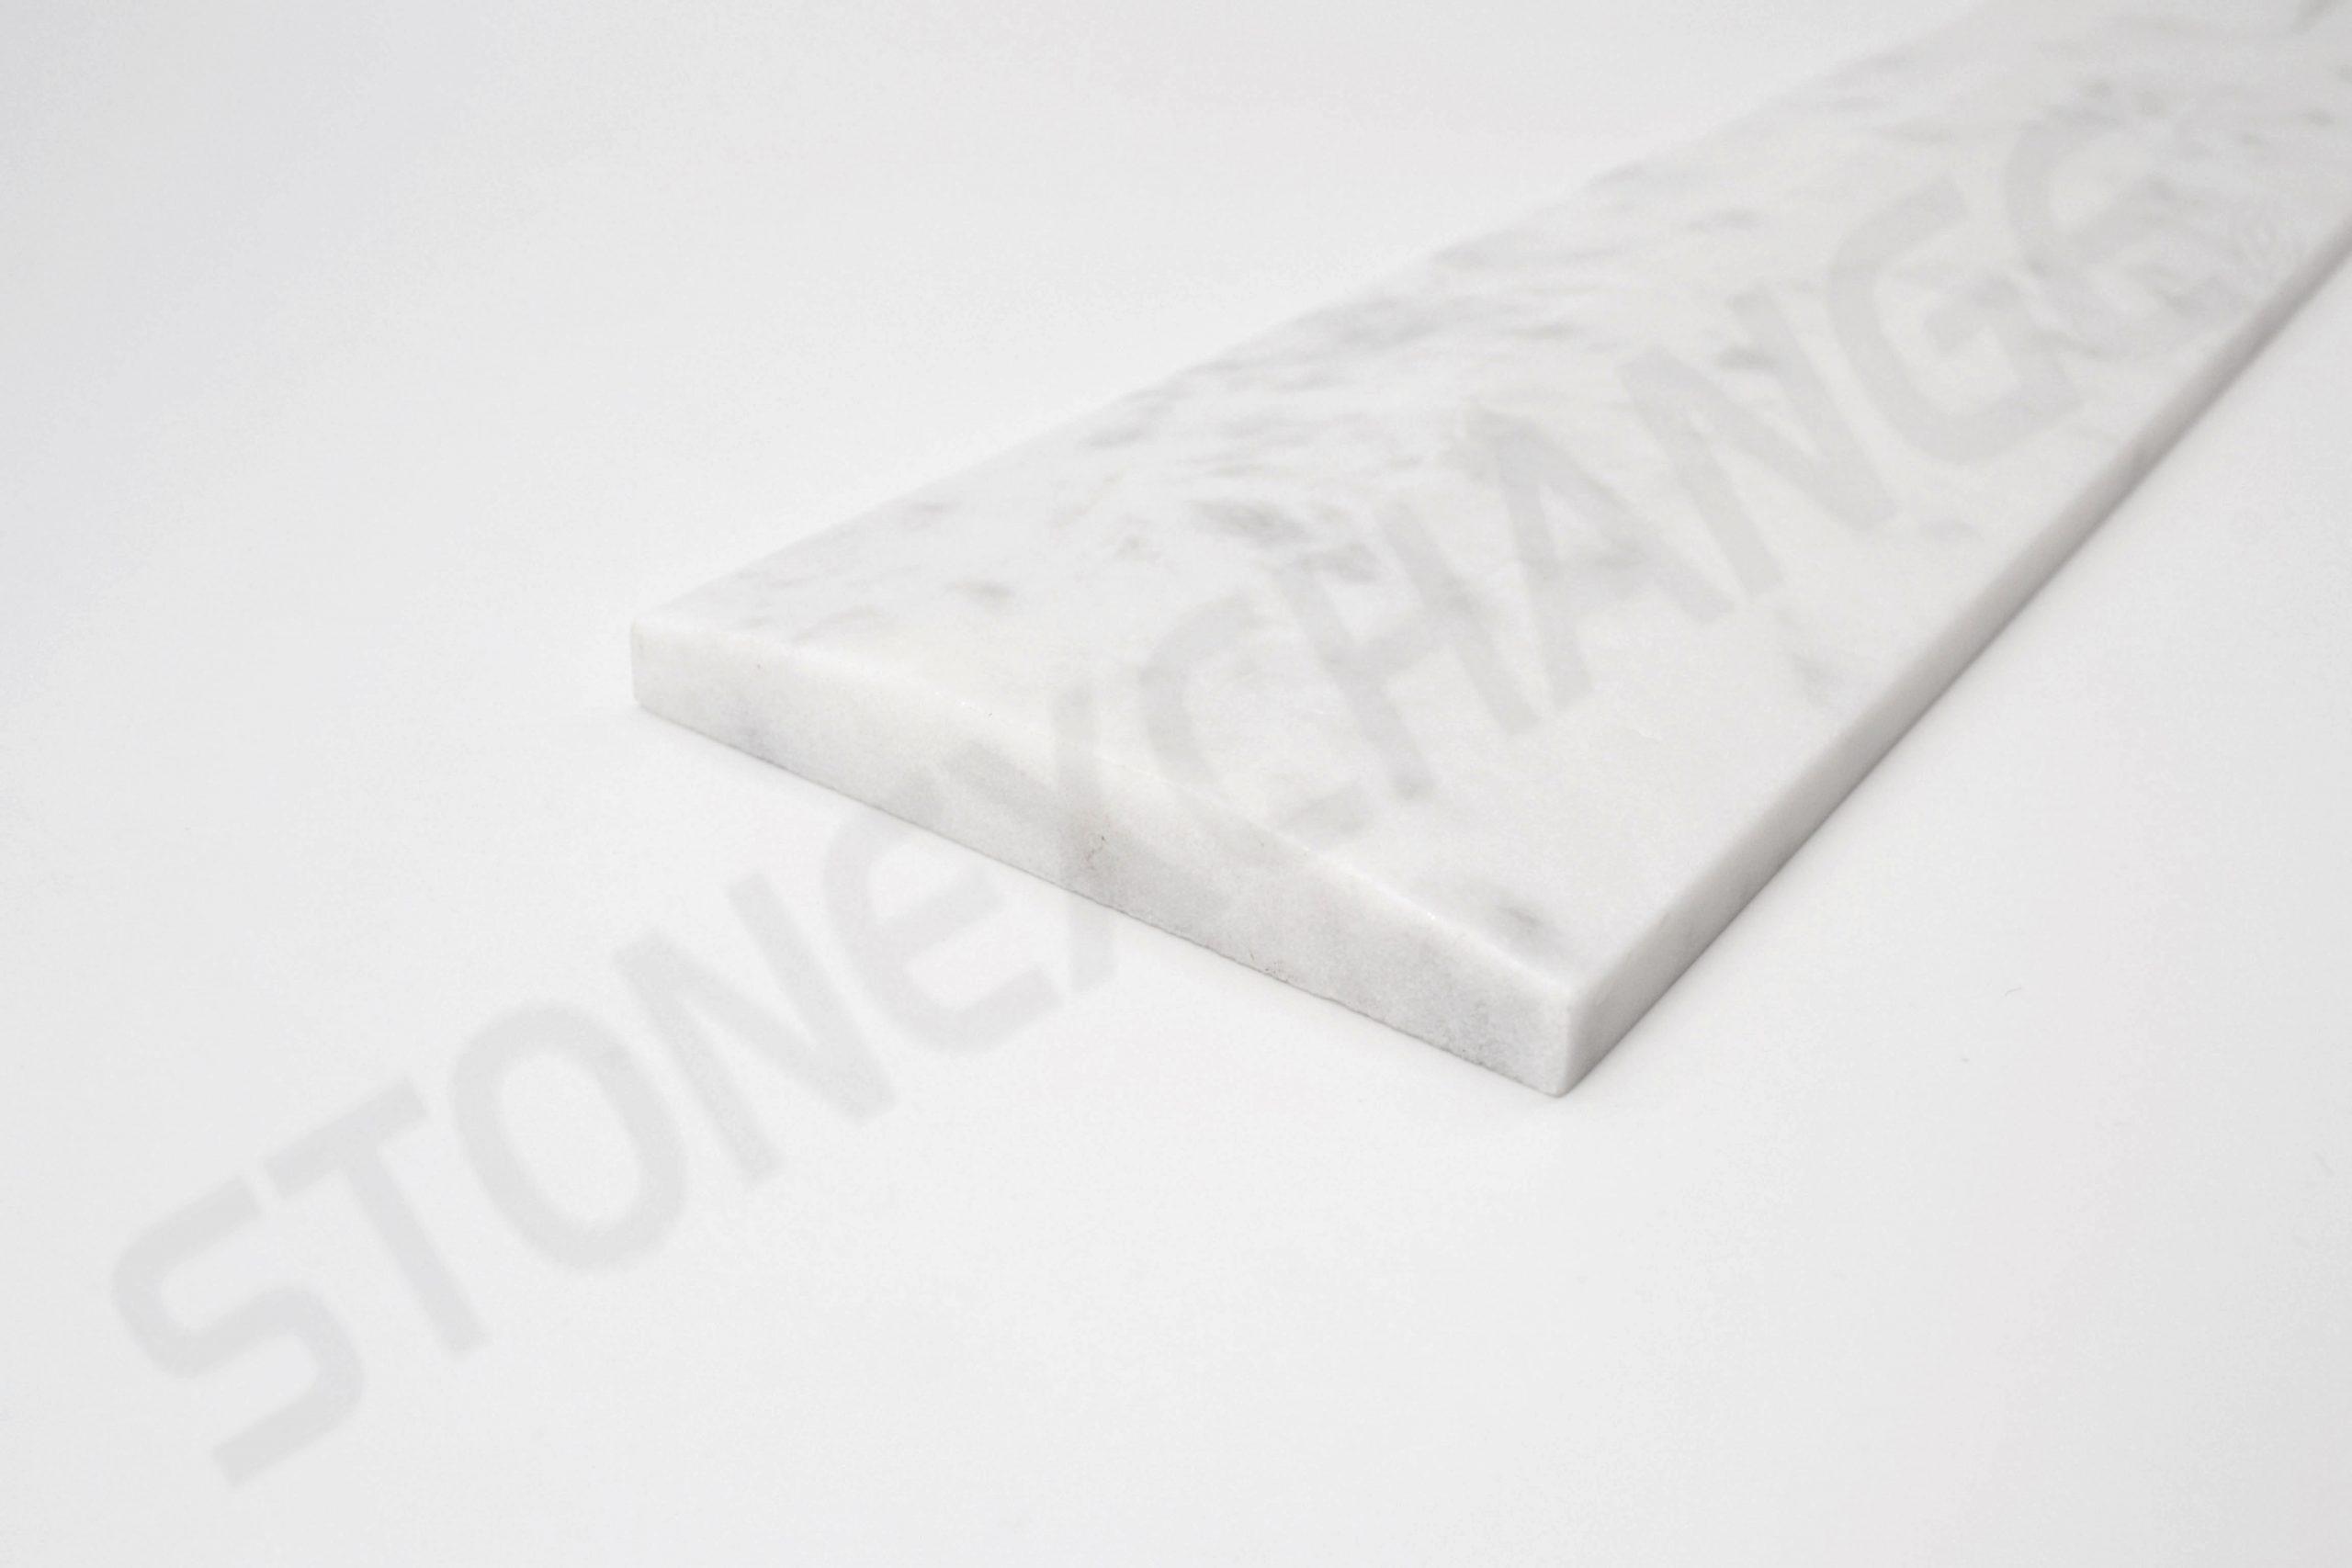 White Carrara Marble Double Hollywood Bevel Threshold 4x36